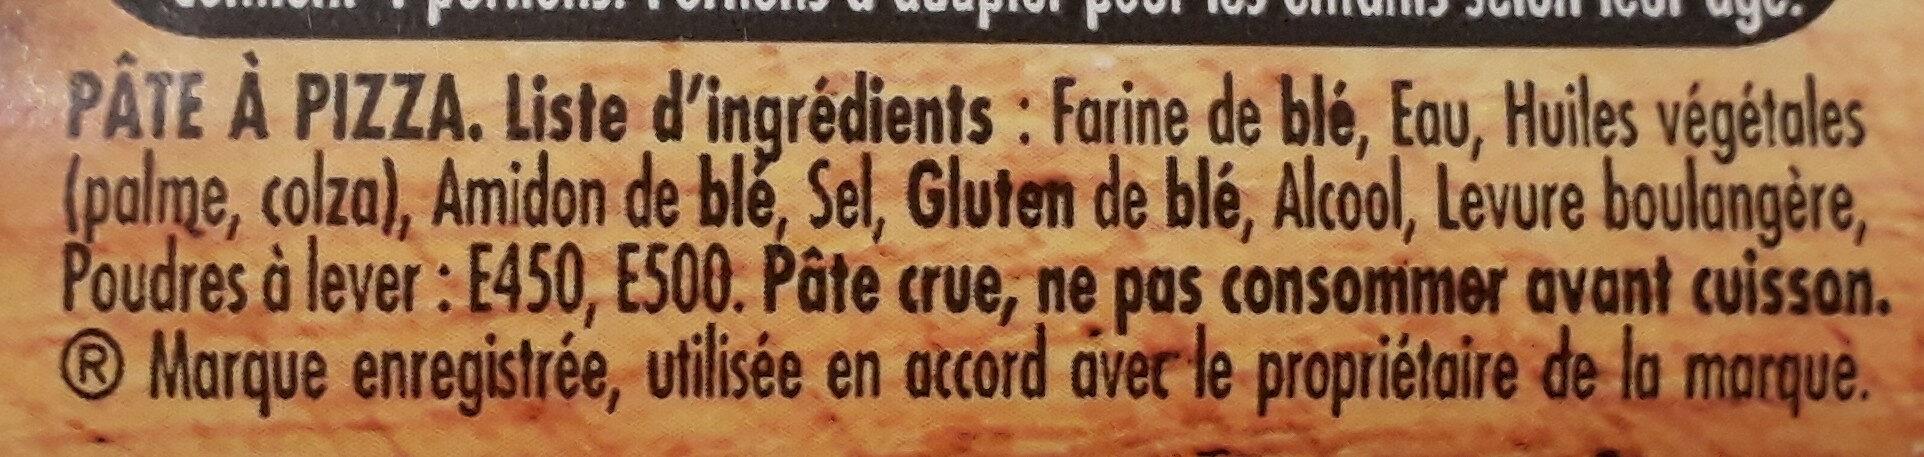 Pâte à pizza Fine & Ronde - Ingrediënten - fr